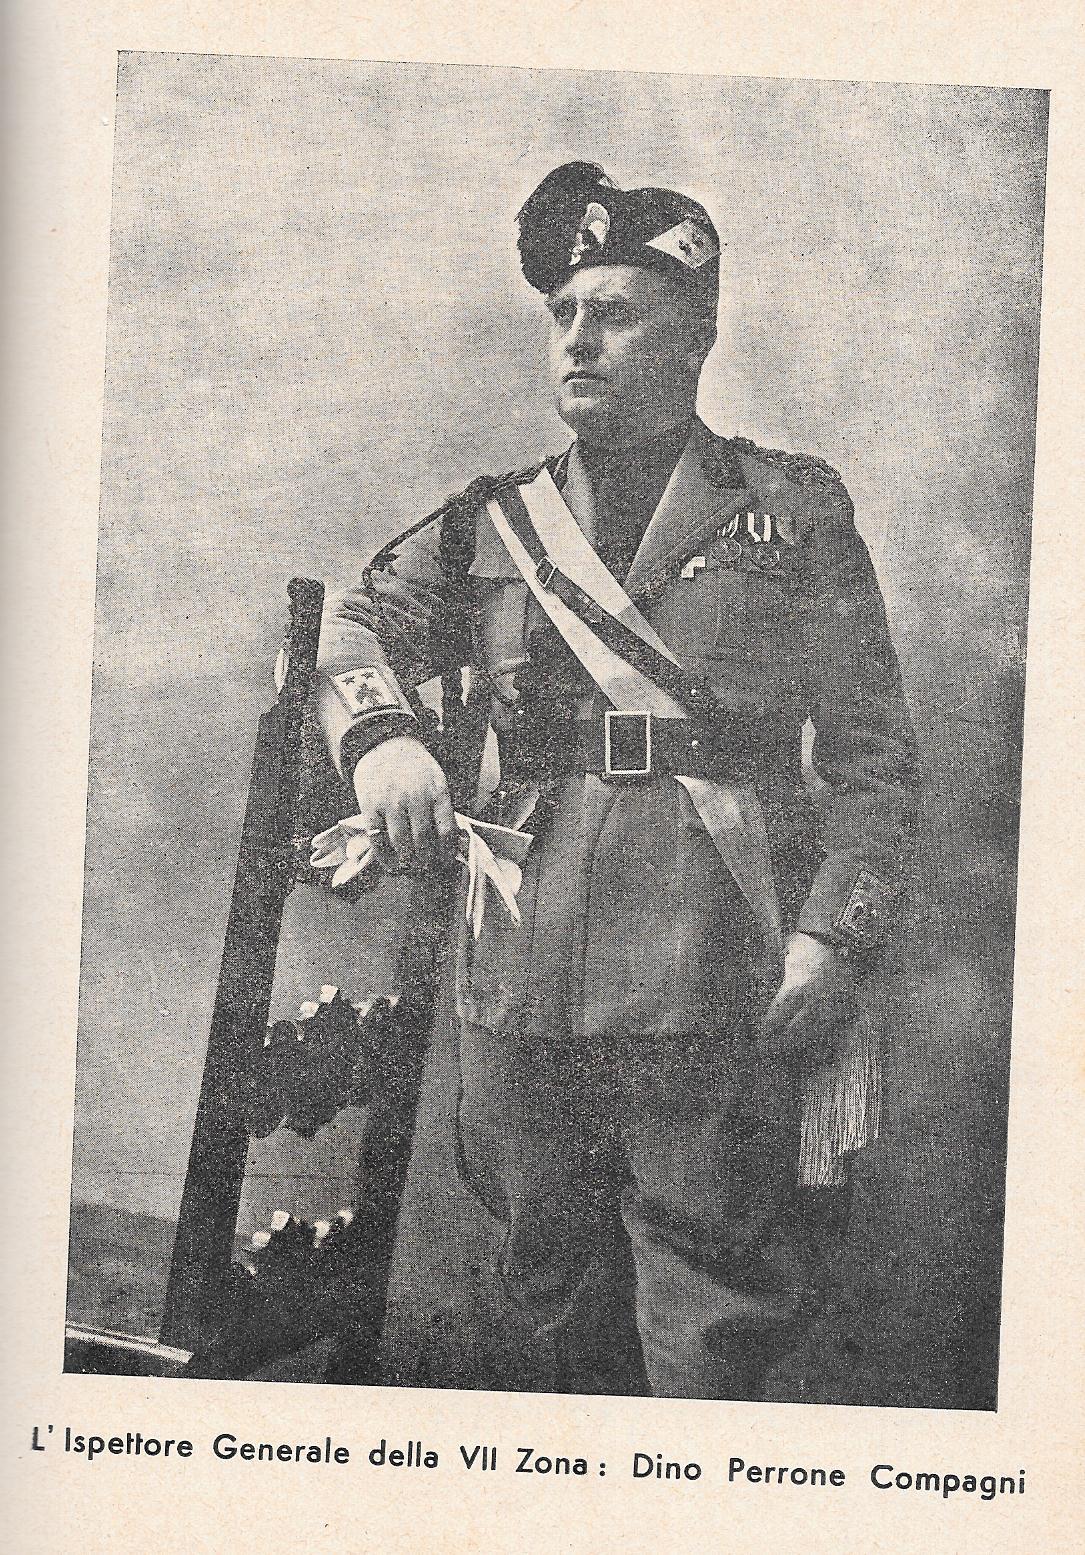 ITALIA 1921: Grosseto 27 giugno – terza parte – Giacinto Reale